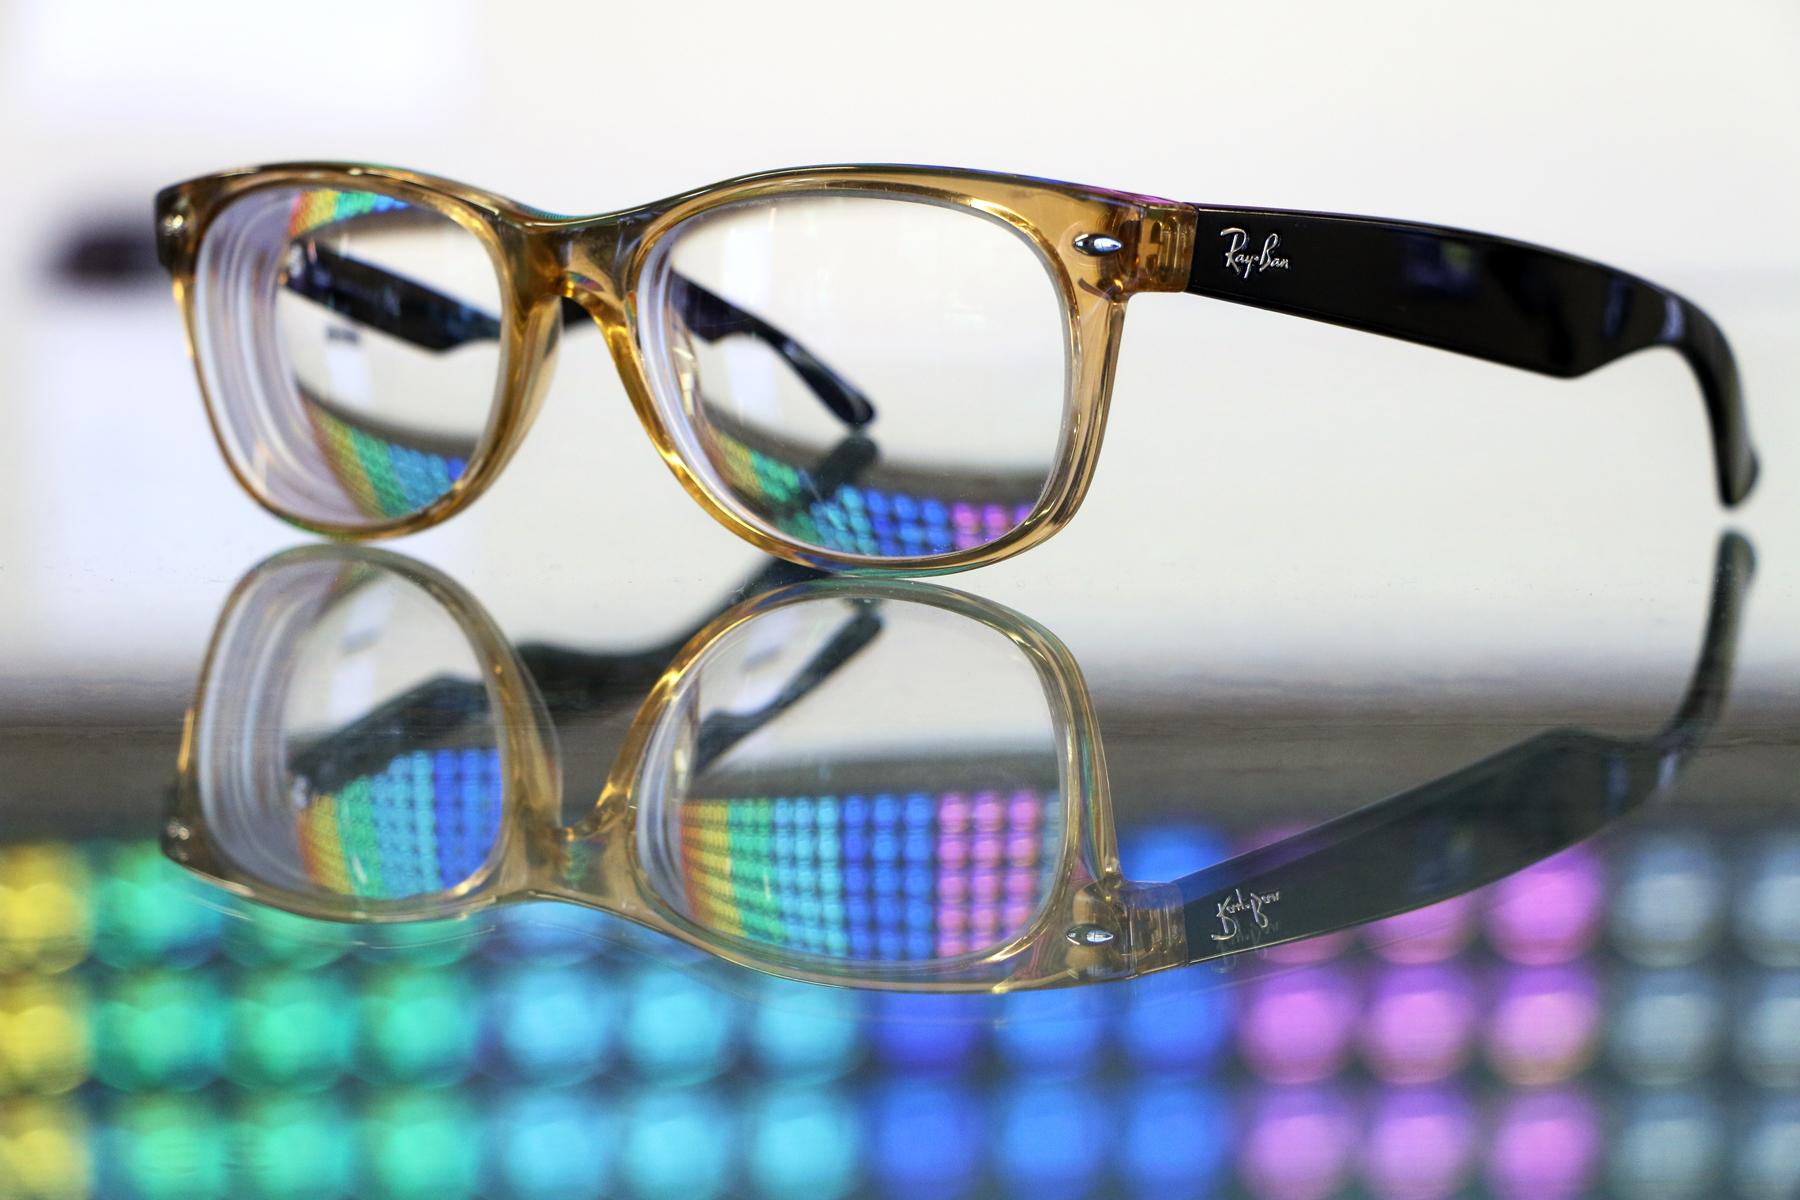 63c6ee5065 Original Wayfarers with clear prescription lenses